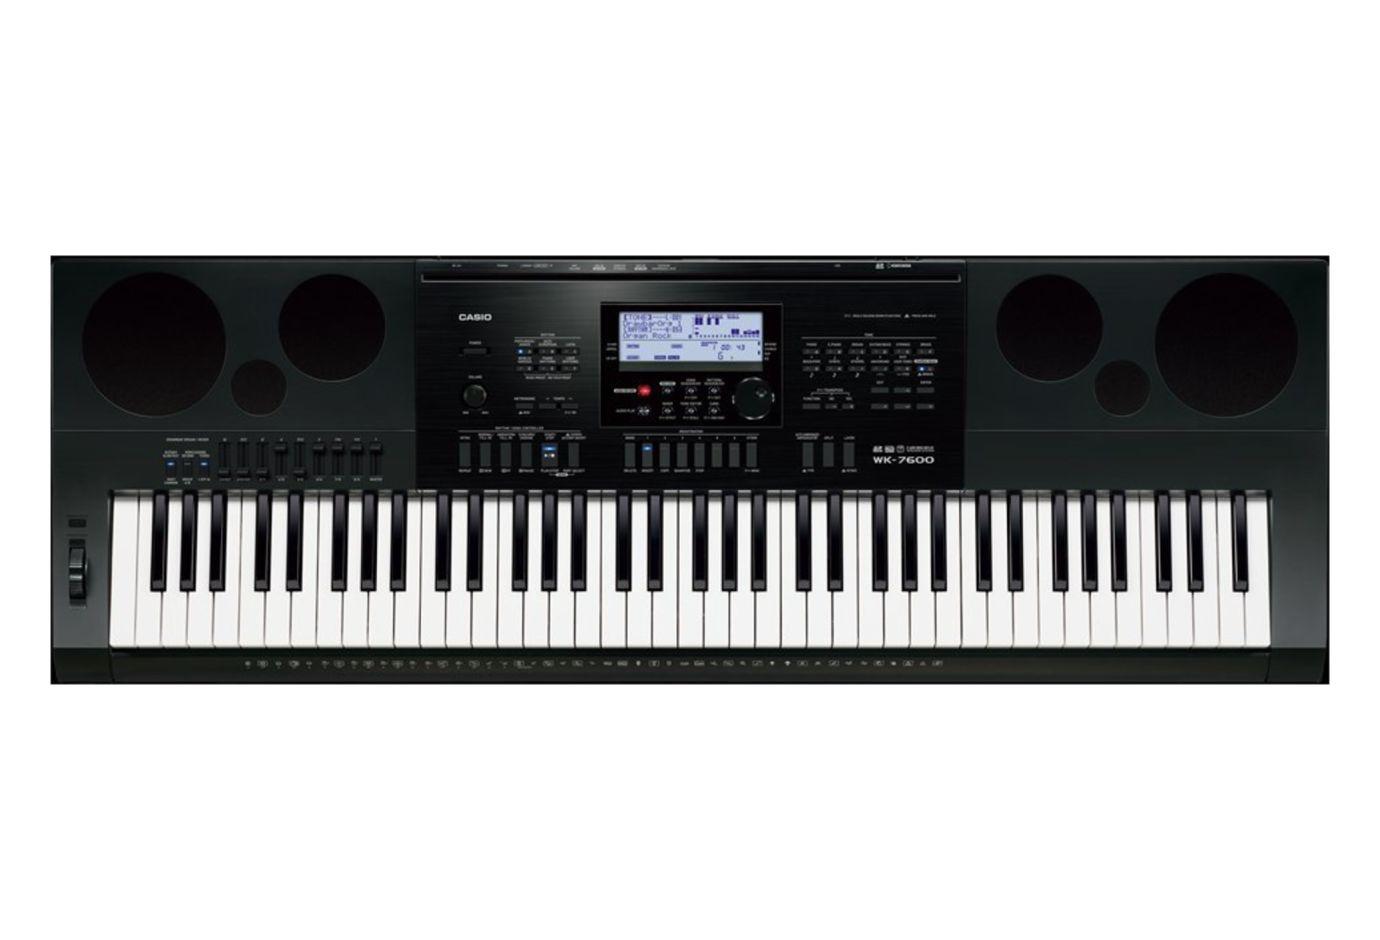 Keyboard Workstation : casio wk 7600 touch sensitive keyboard workstation ~ Russianpoet.info Haus und Dekorationen